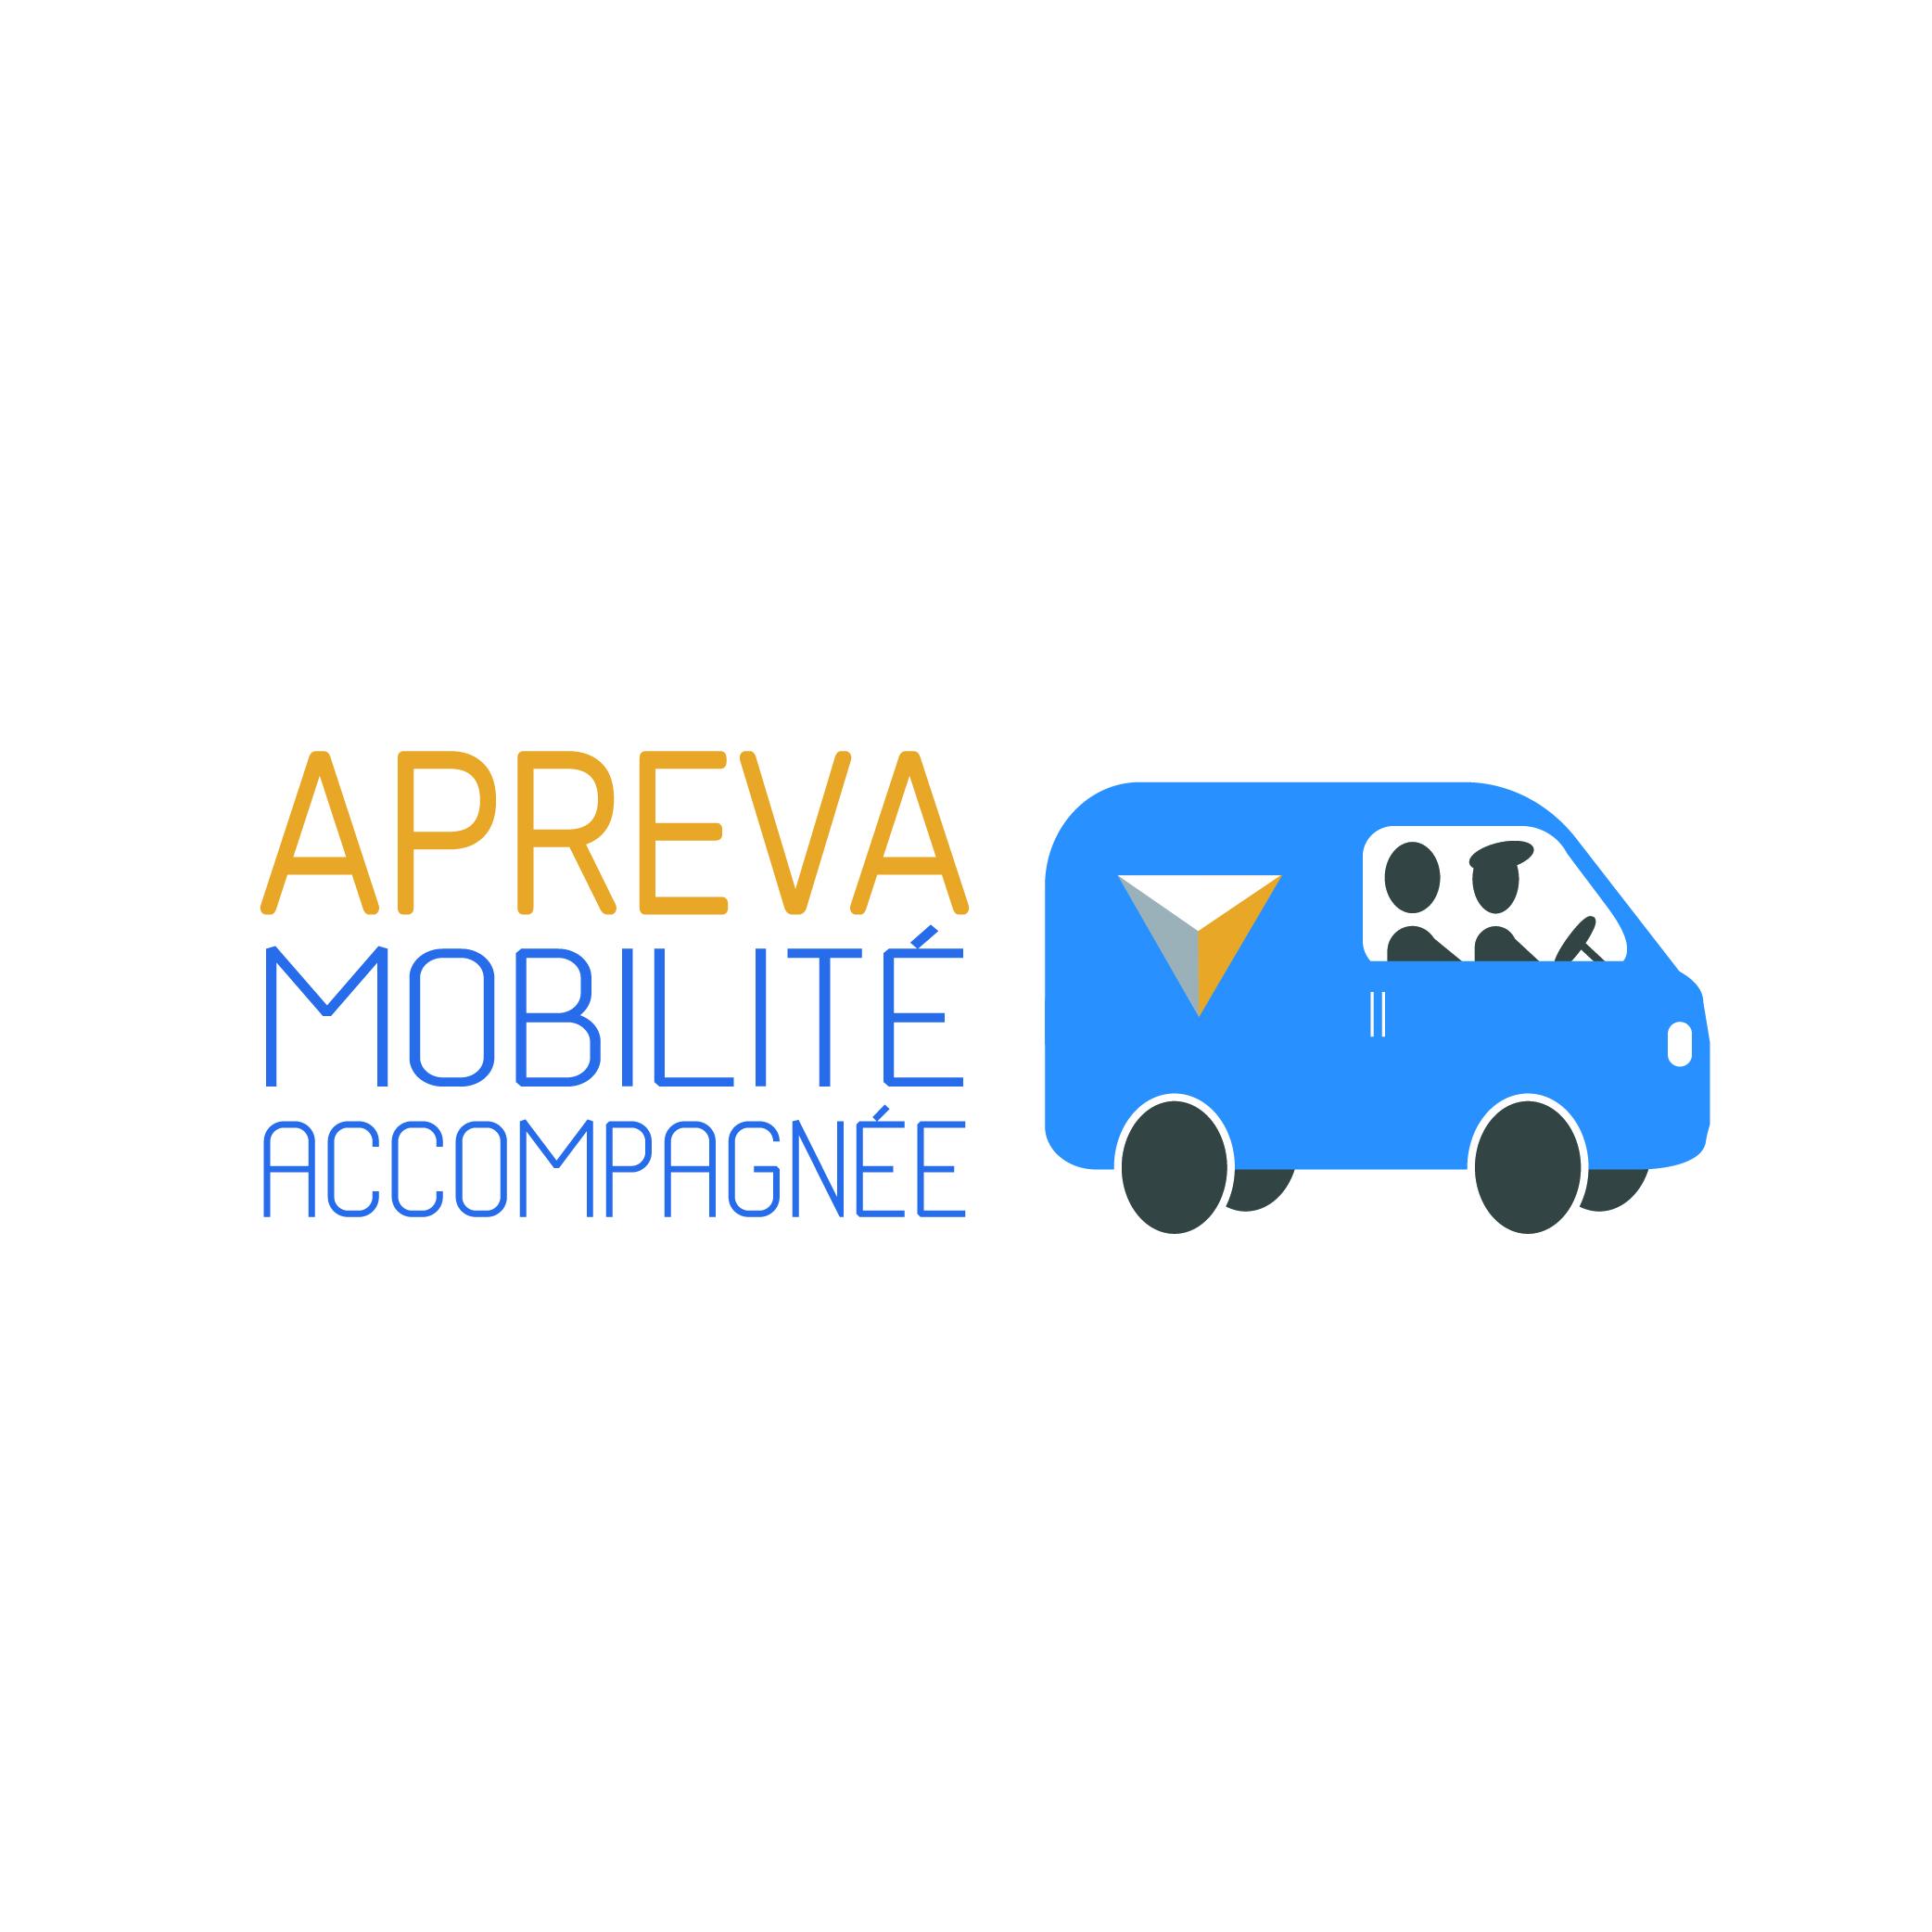 logo_2222_apreva_mobilite_accompagnee_01.jpg